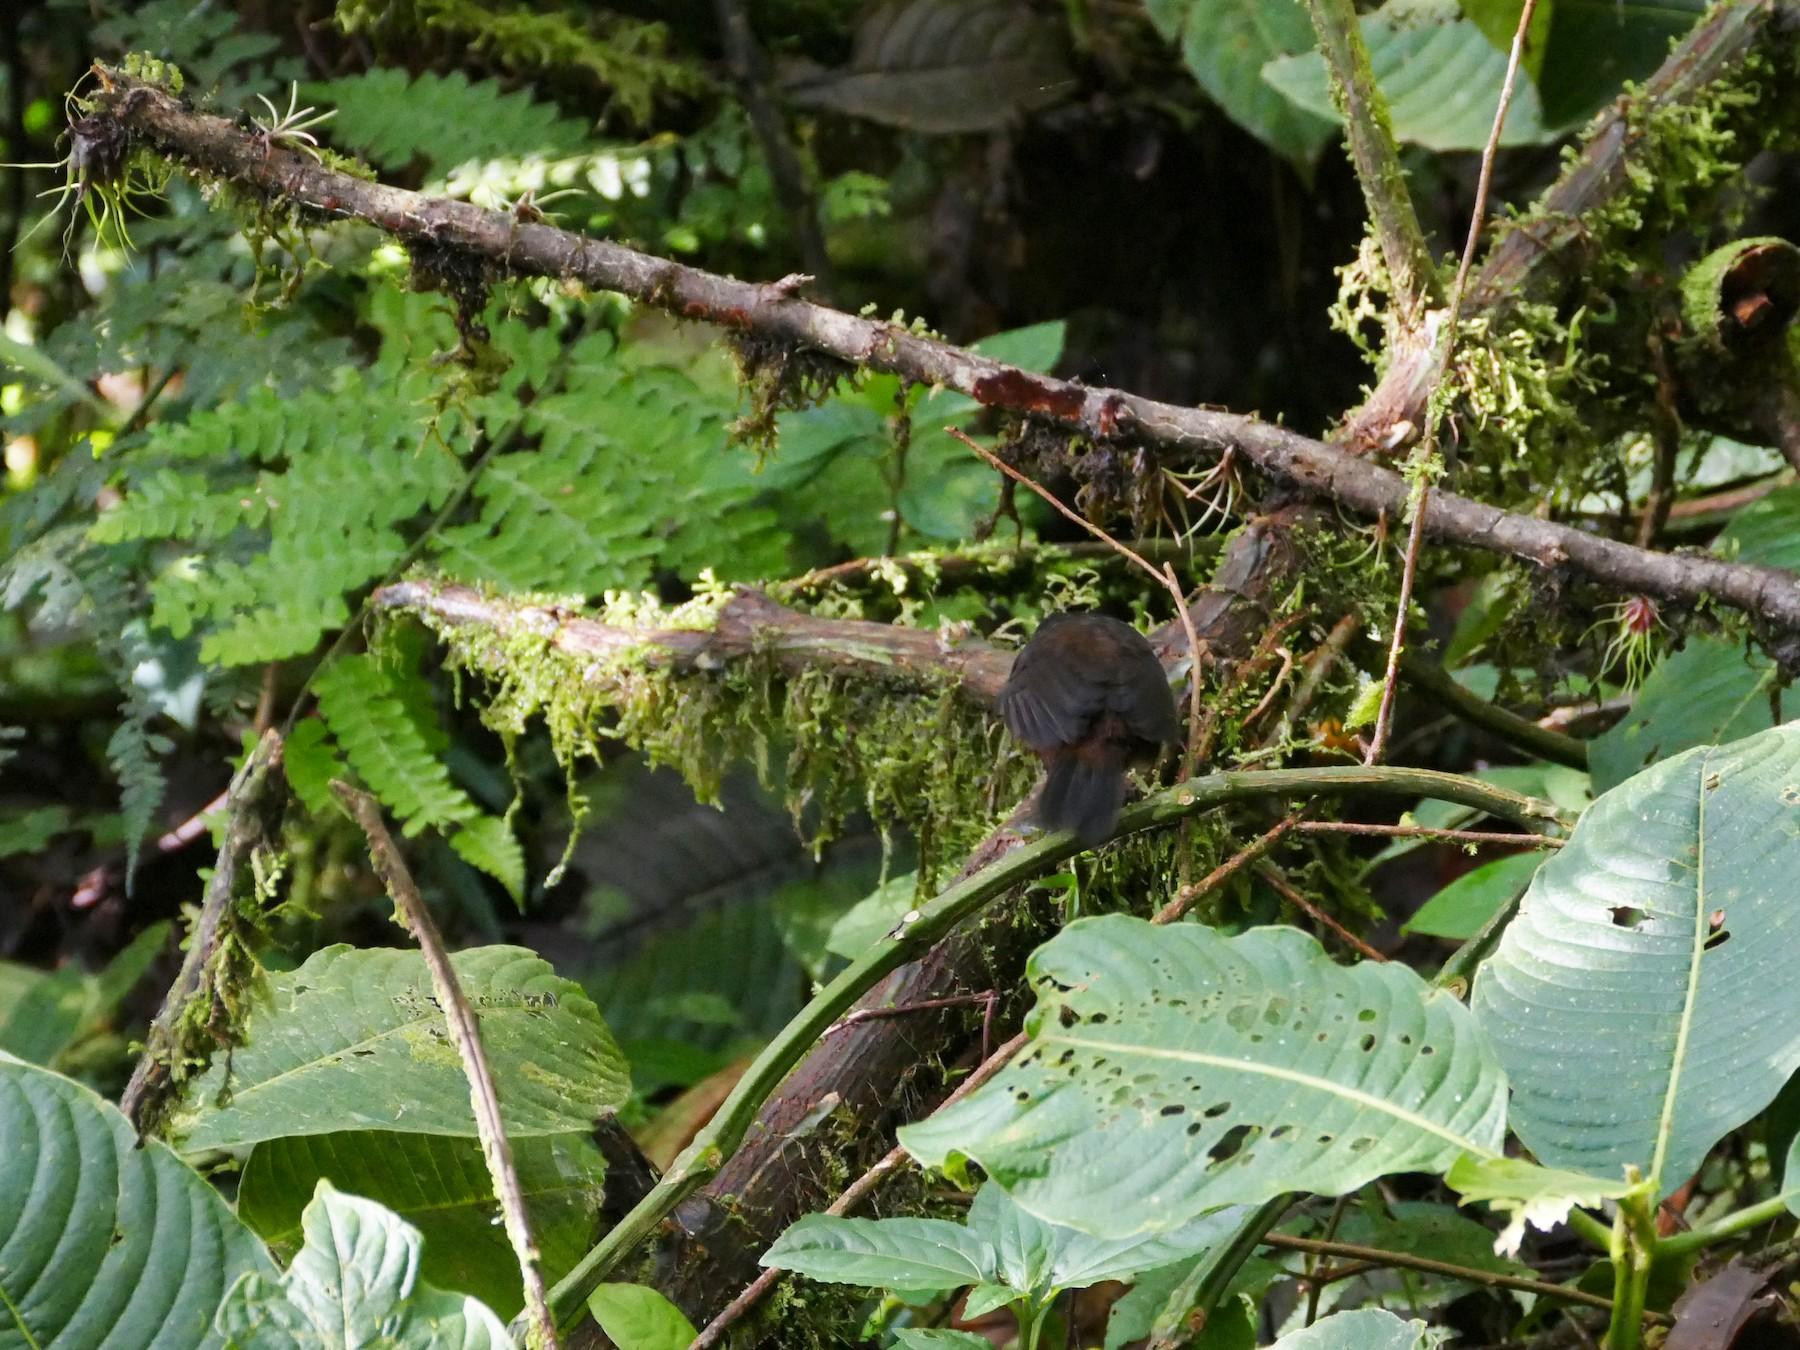 Long-tailed Tapaculo - Peter Kaestner